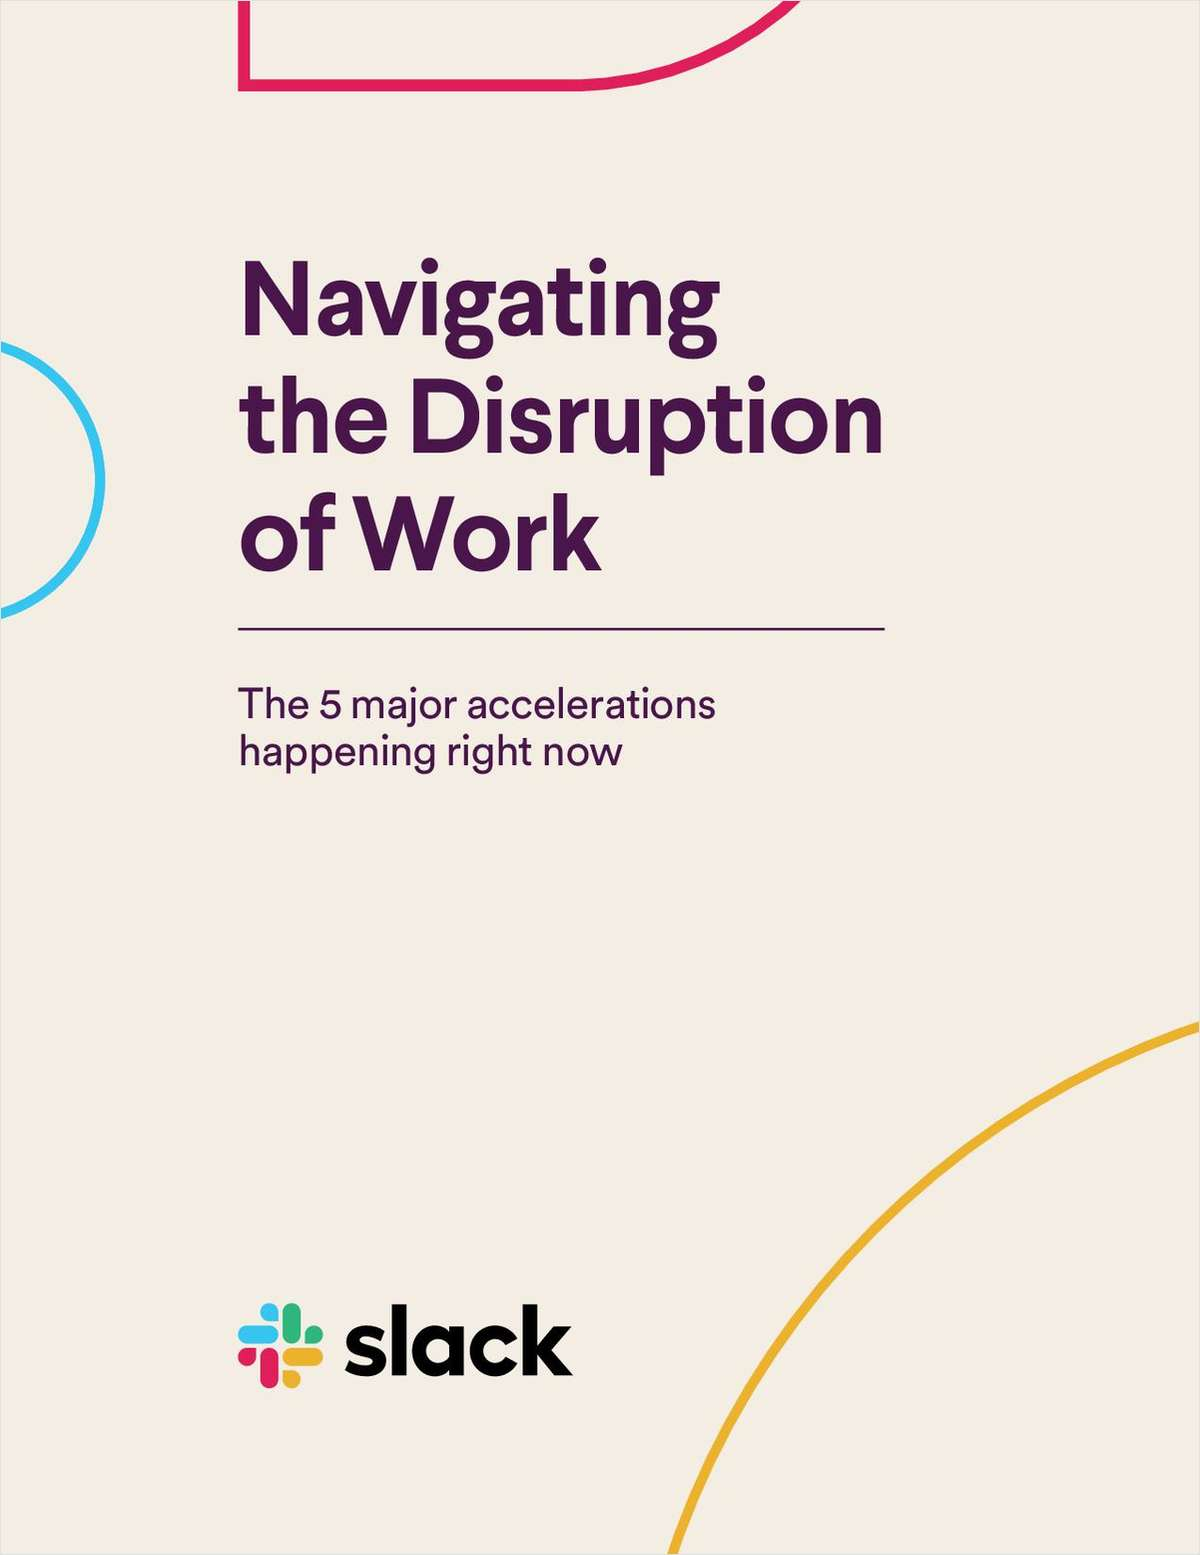 Disruption of Work